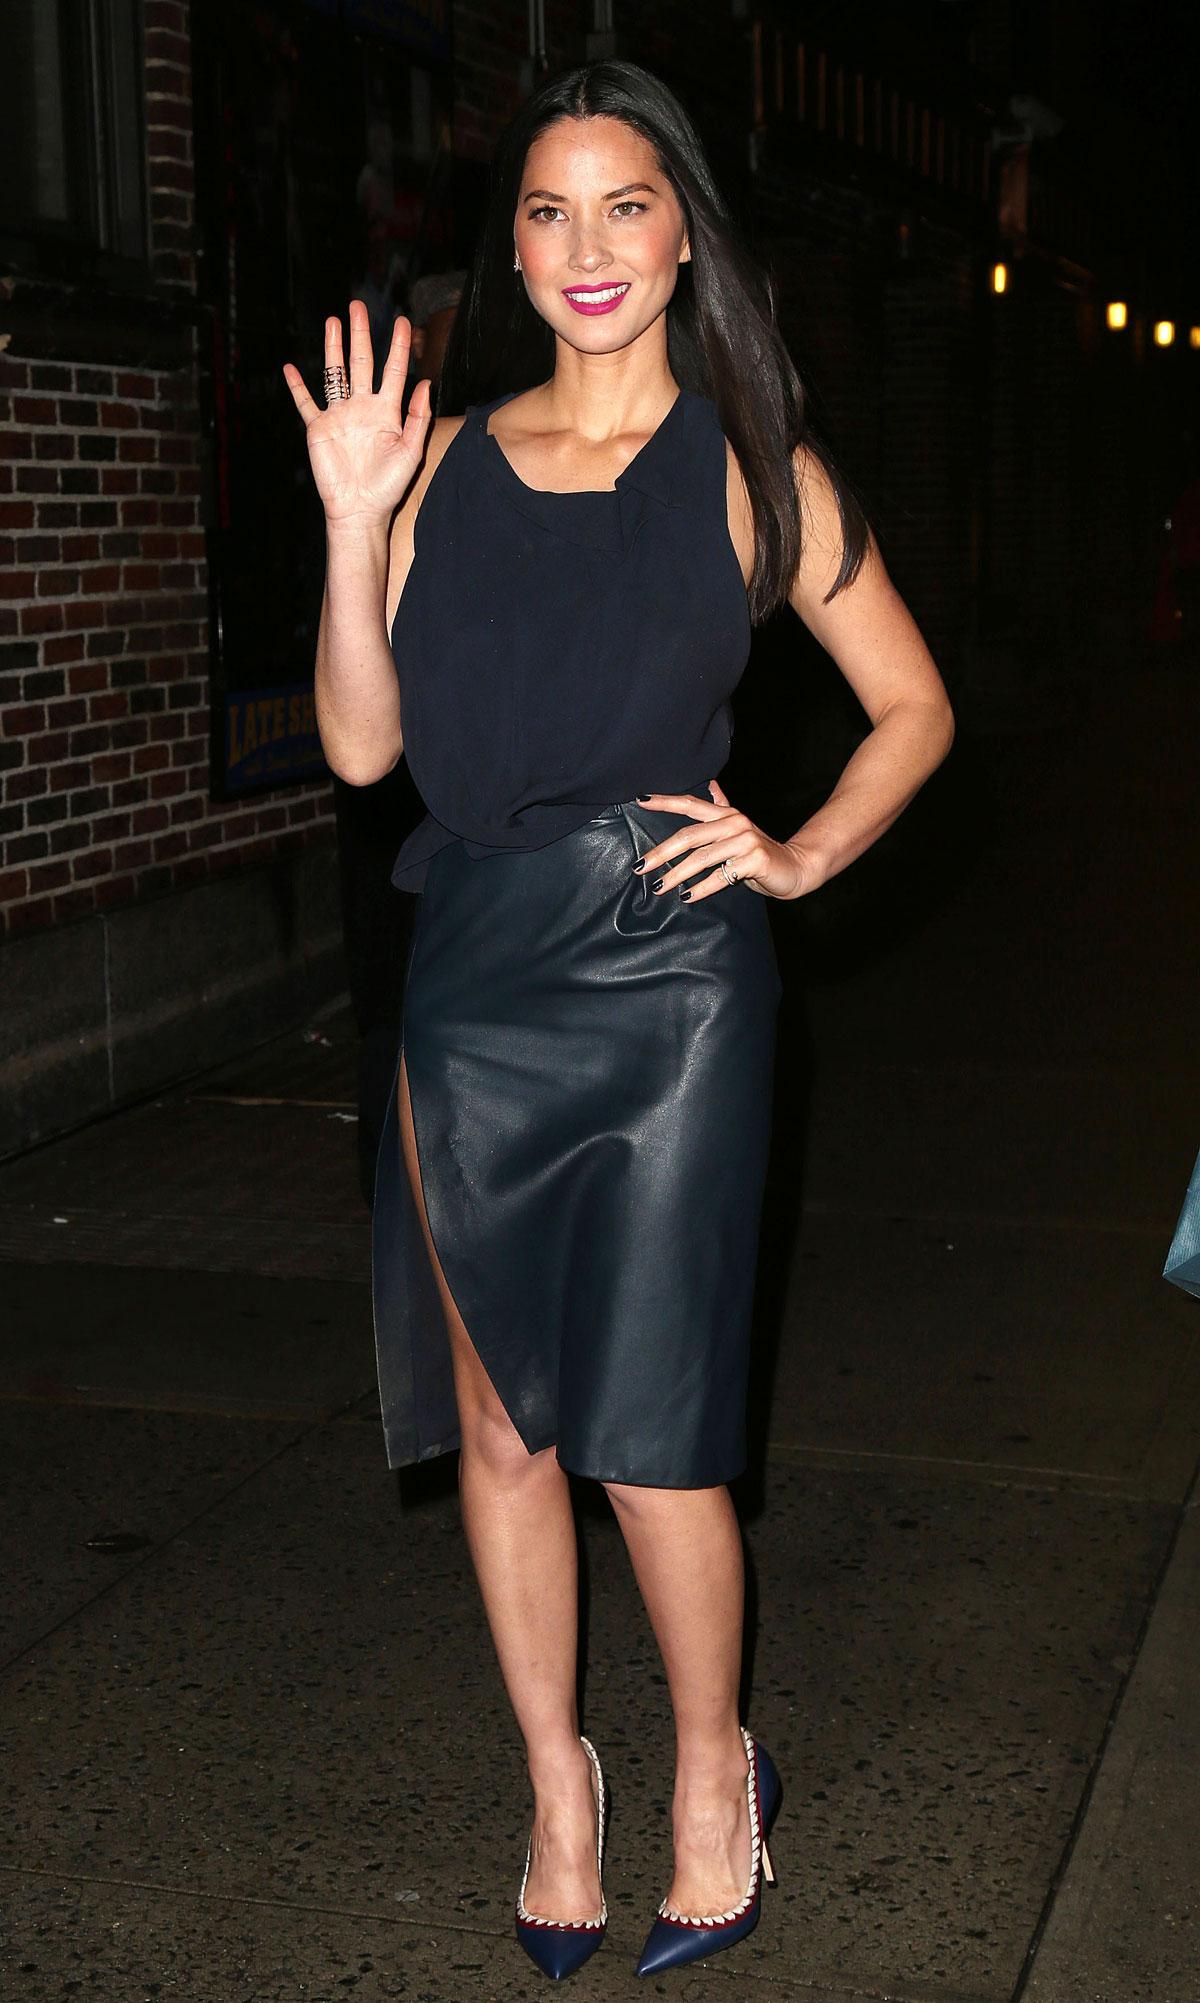 Olivia Munn attends Spike TV Guy Choice Awards 2014